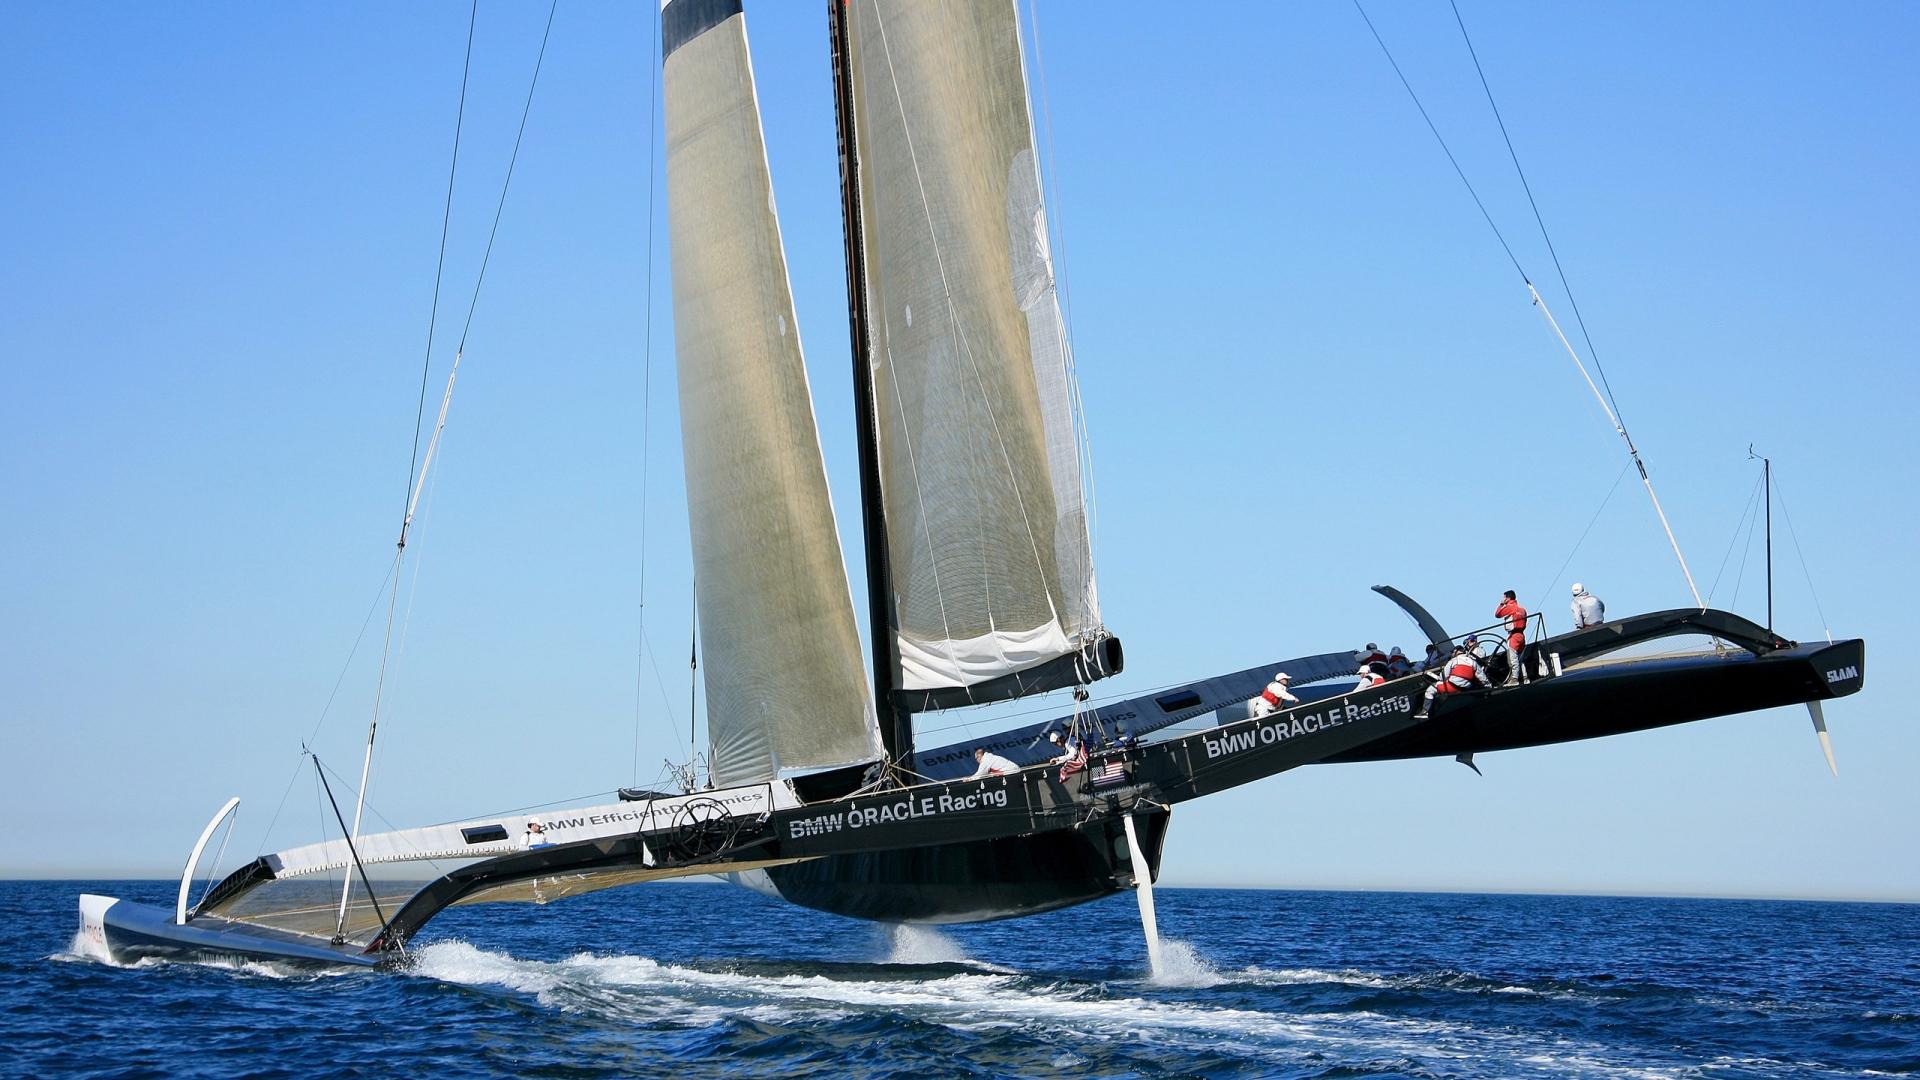 catamaran-ocean-black-sea-ship-1920x1080-1920%C3%971080-wallpaper-wp3603955